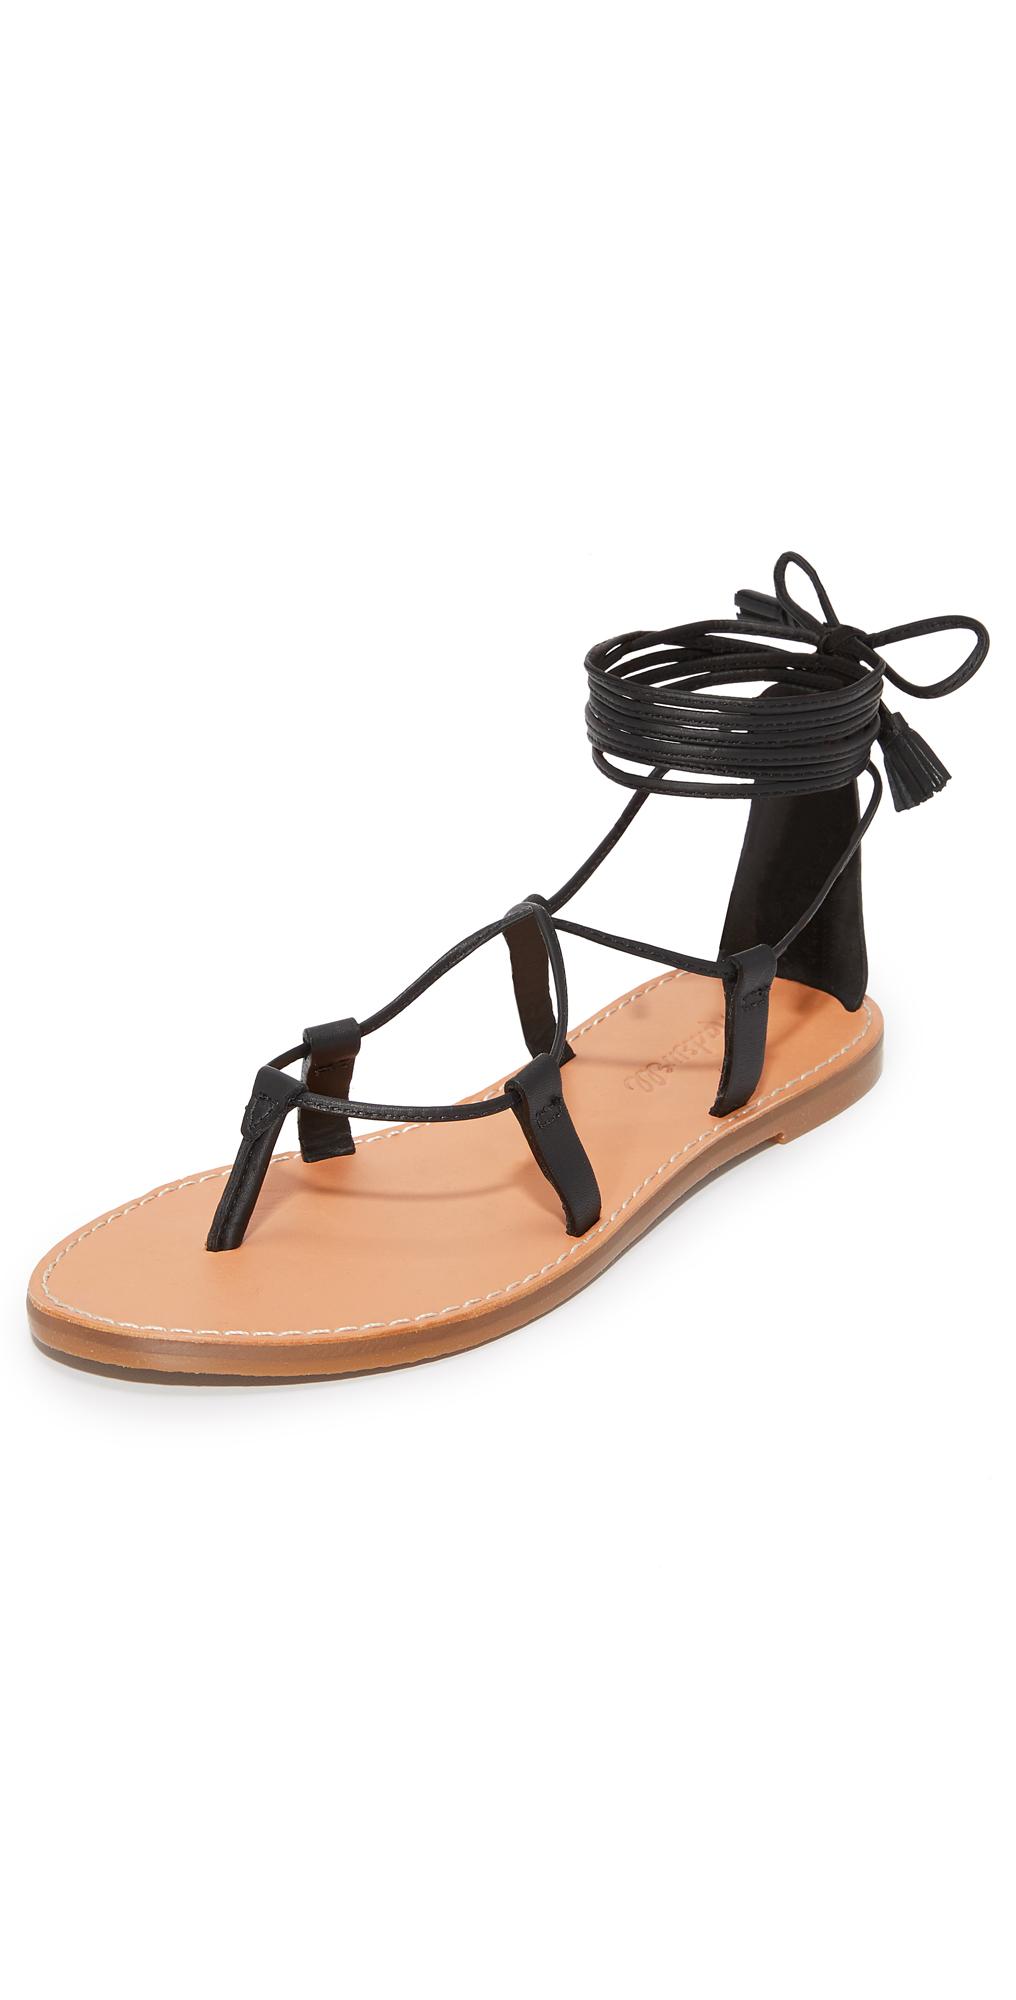 Kana Lace Up Gladiator Sandals Madewell